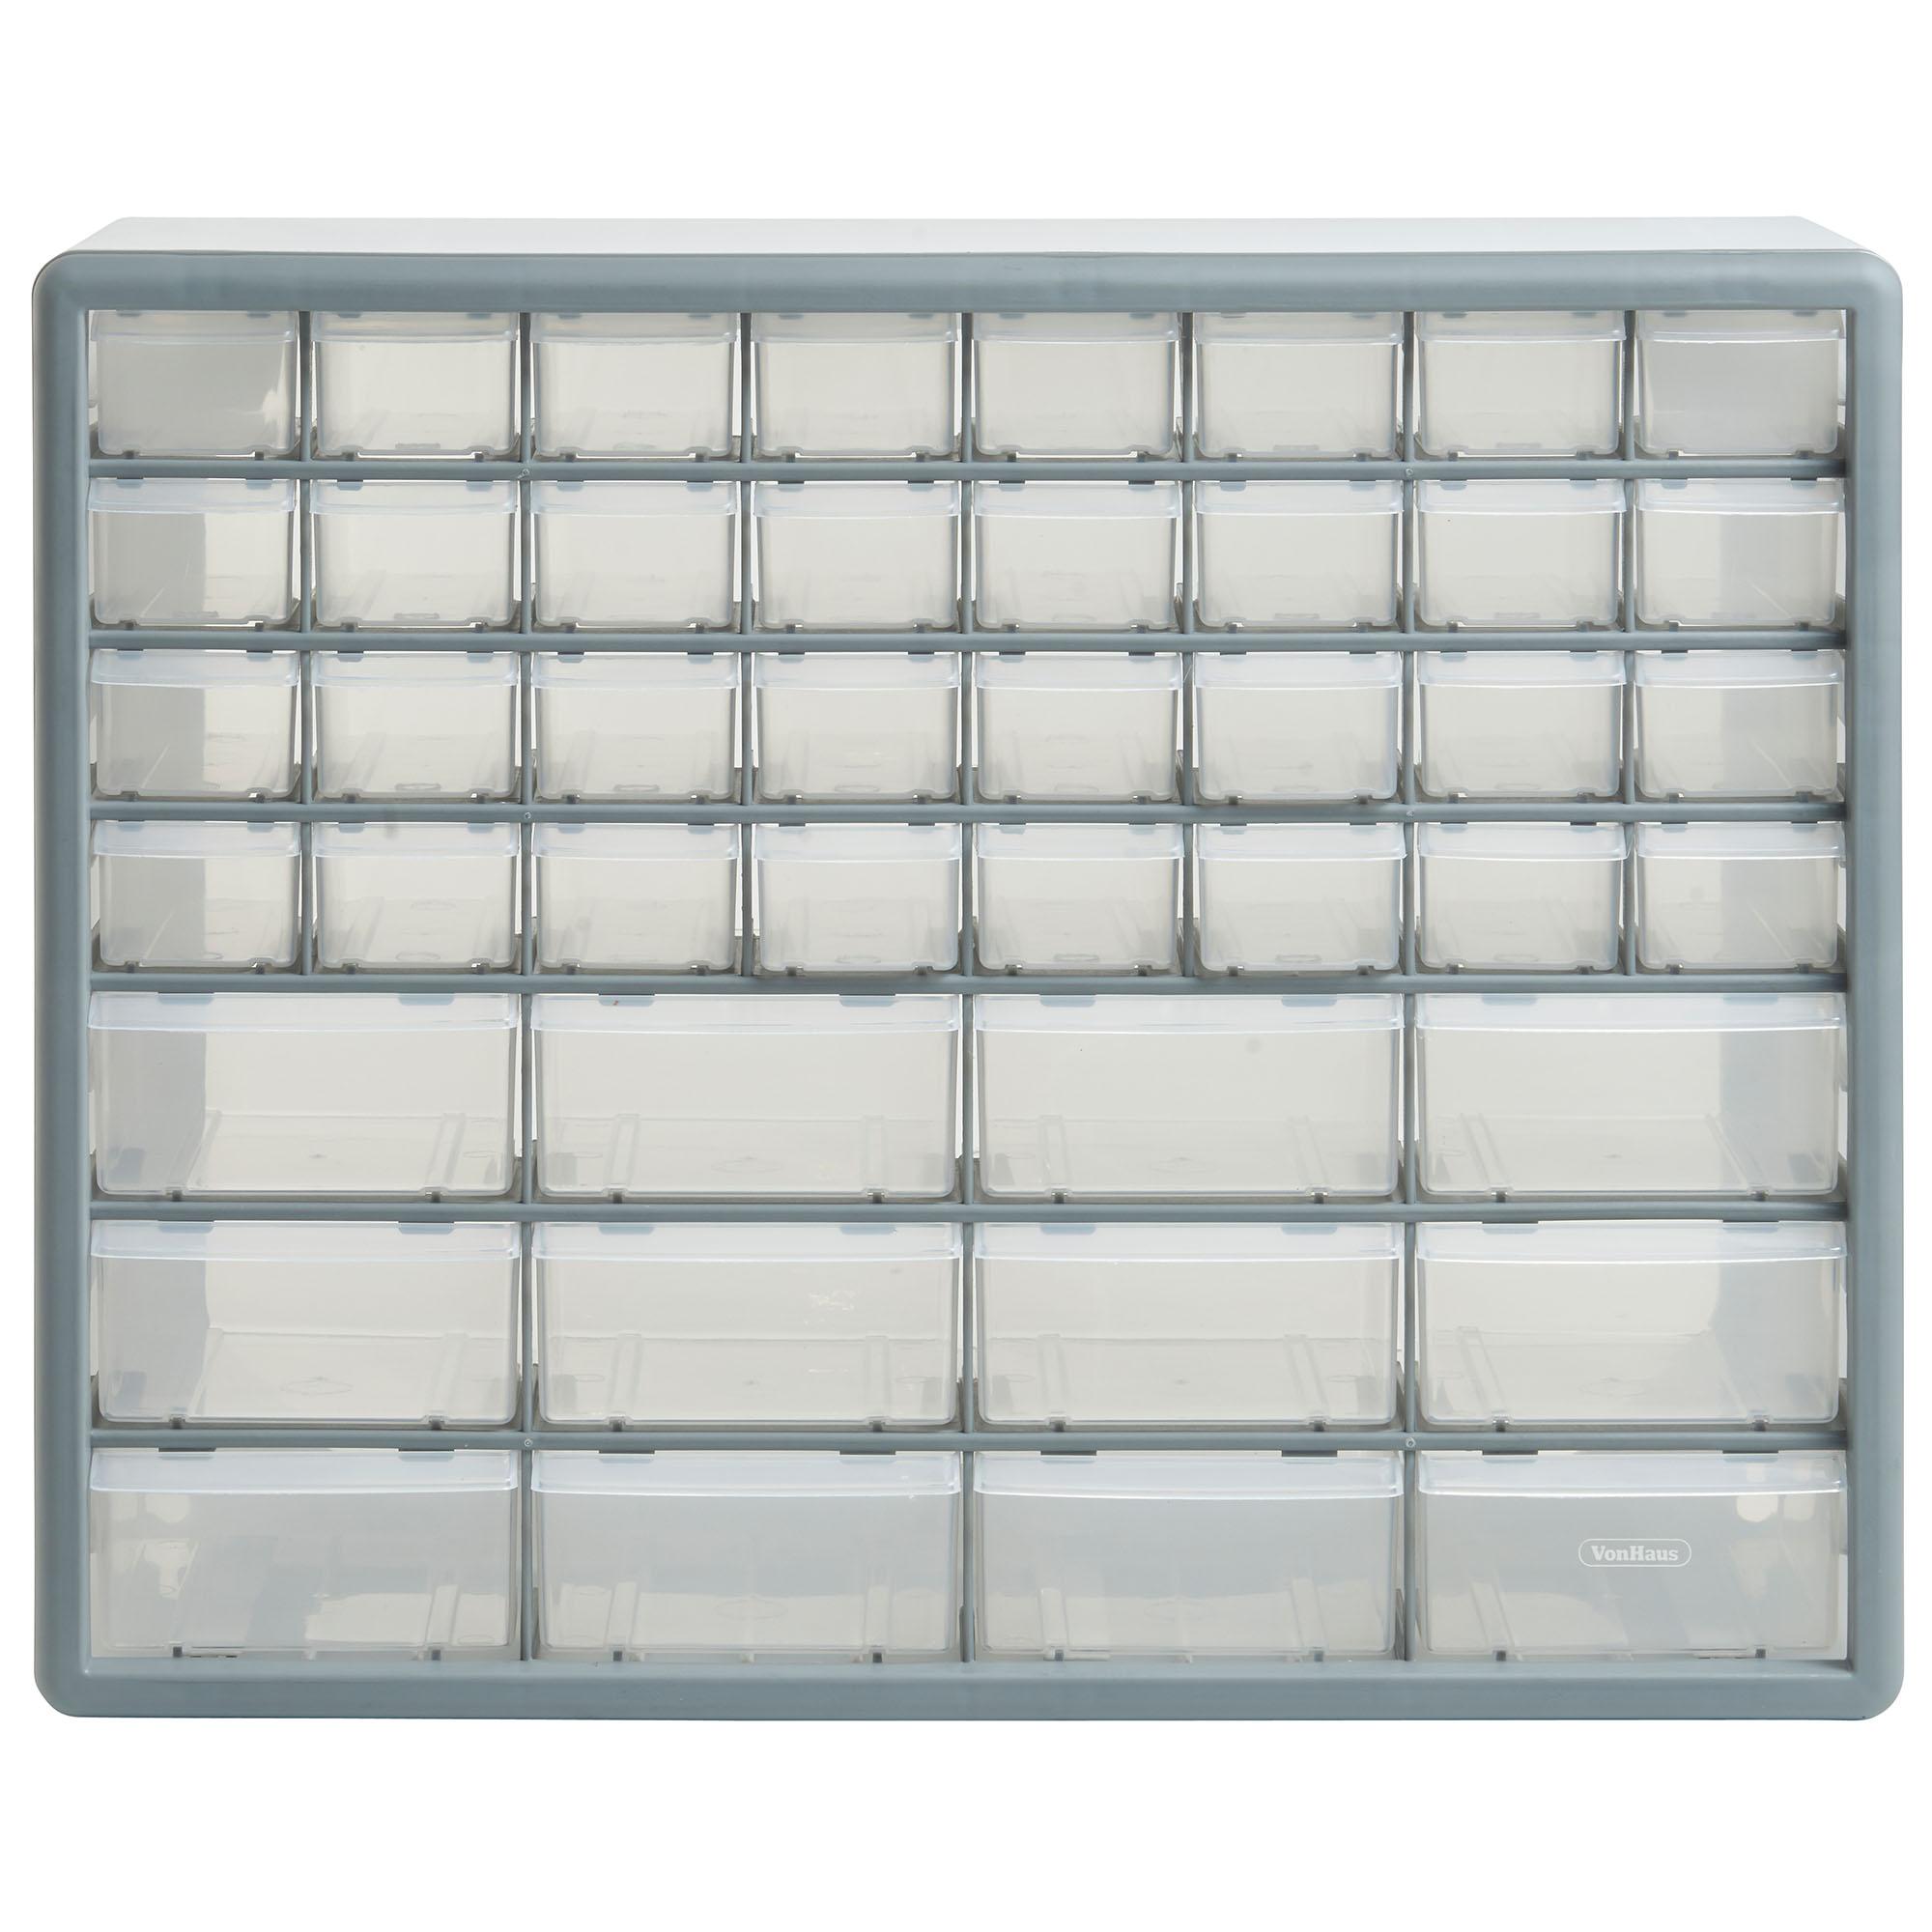 Small Parts Storage 8 Drawers Cabinet Screws Nails: VonHaus 44 Multi Drawer Organiser Nail Bolt Screw Craft